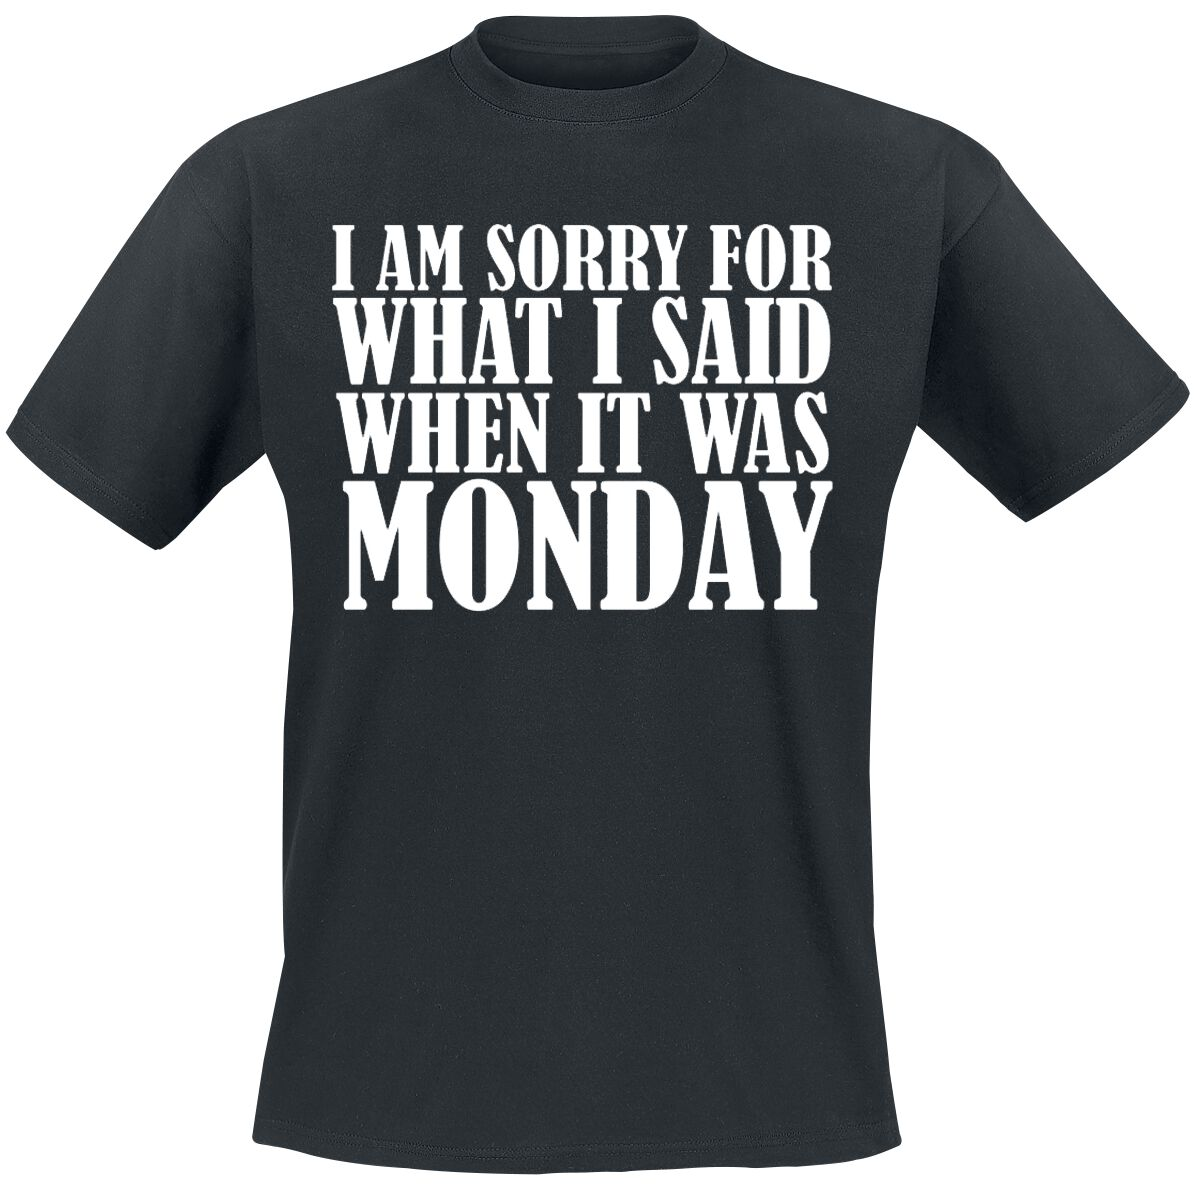 Fun Shirts - Koszulki - T-Shirt I Am Sorry For What I Said When It Was Monday T-Shirt czarny - 375619